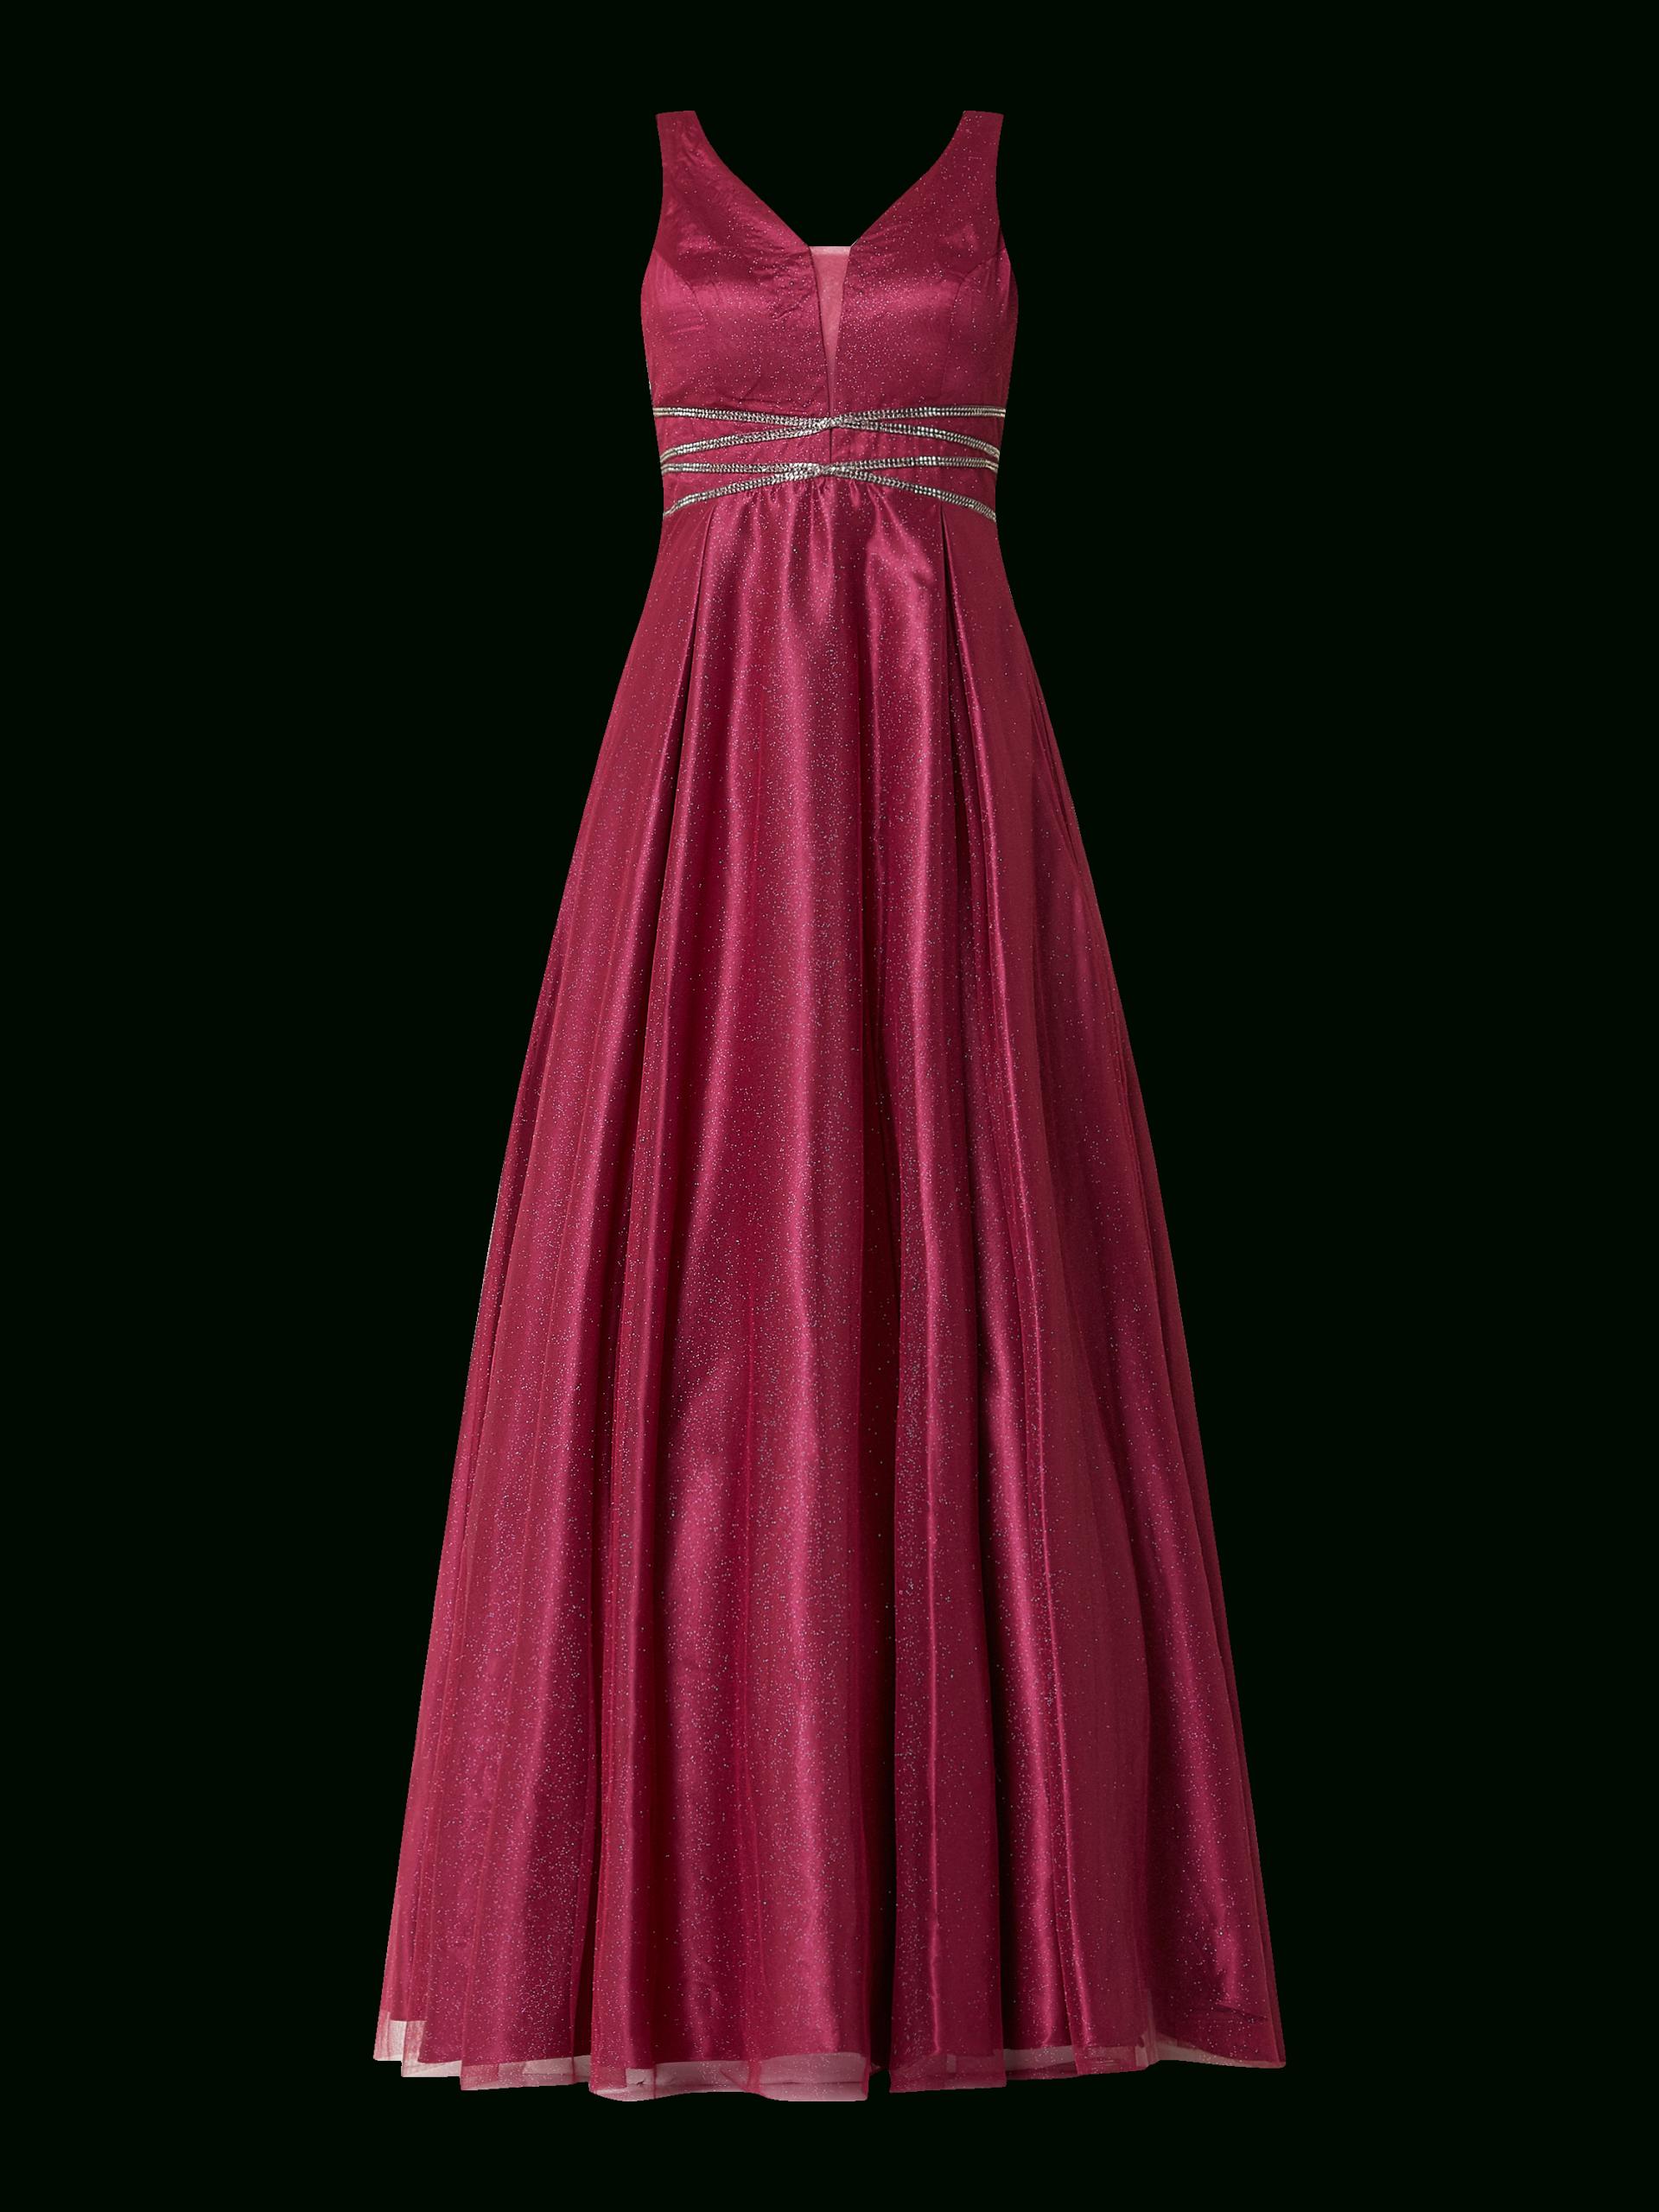 Formal Elegant Troyden Abendkleid GalerieAbend Elegant Troyden Abendkleid Ärmel